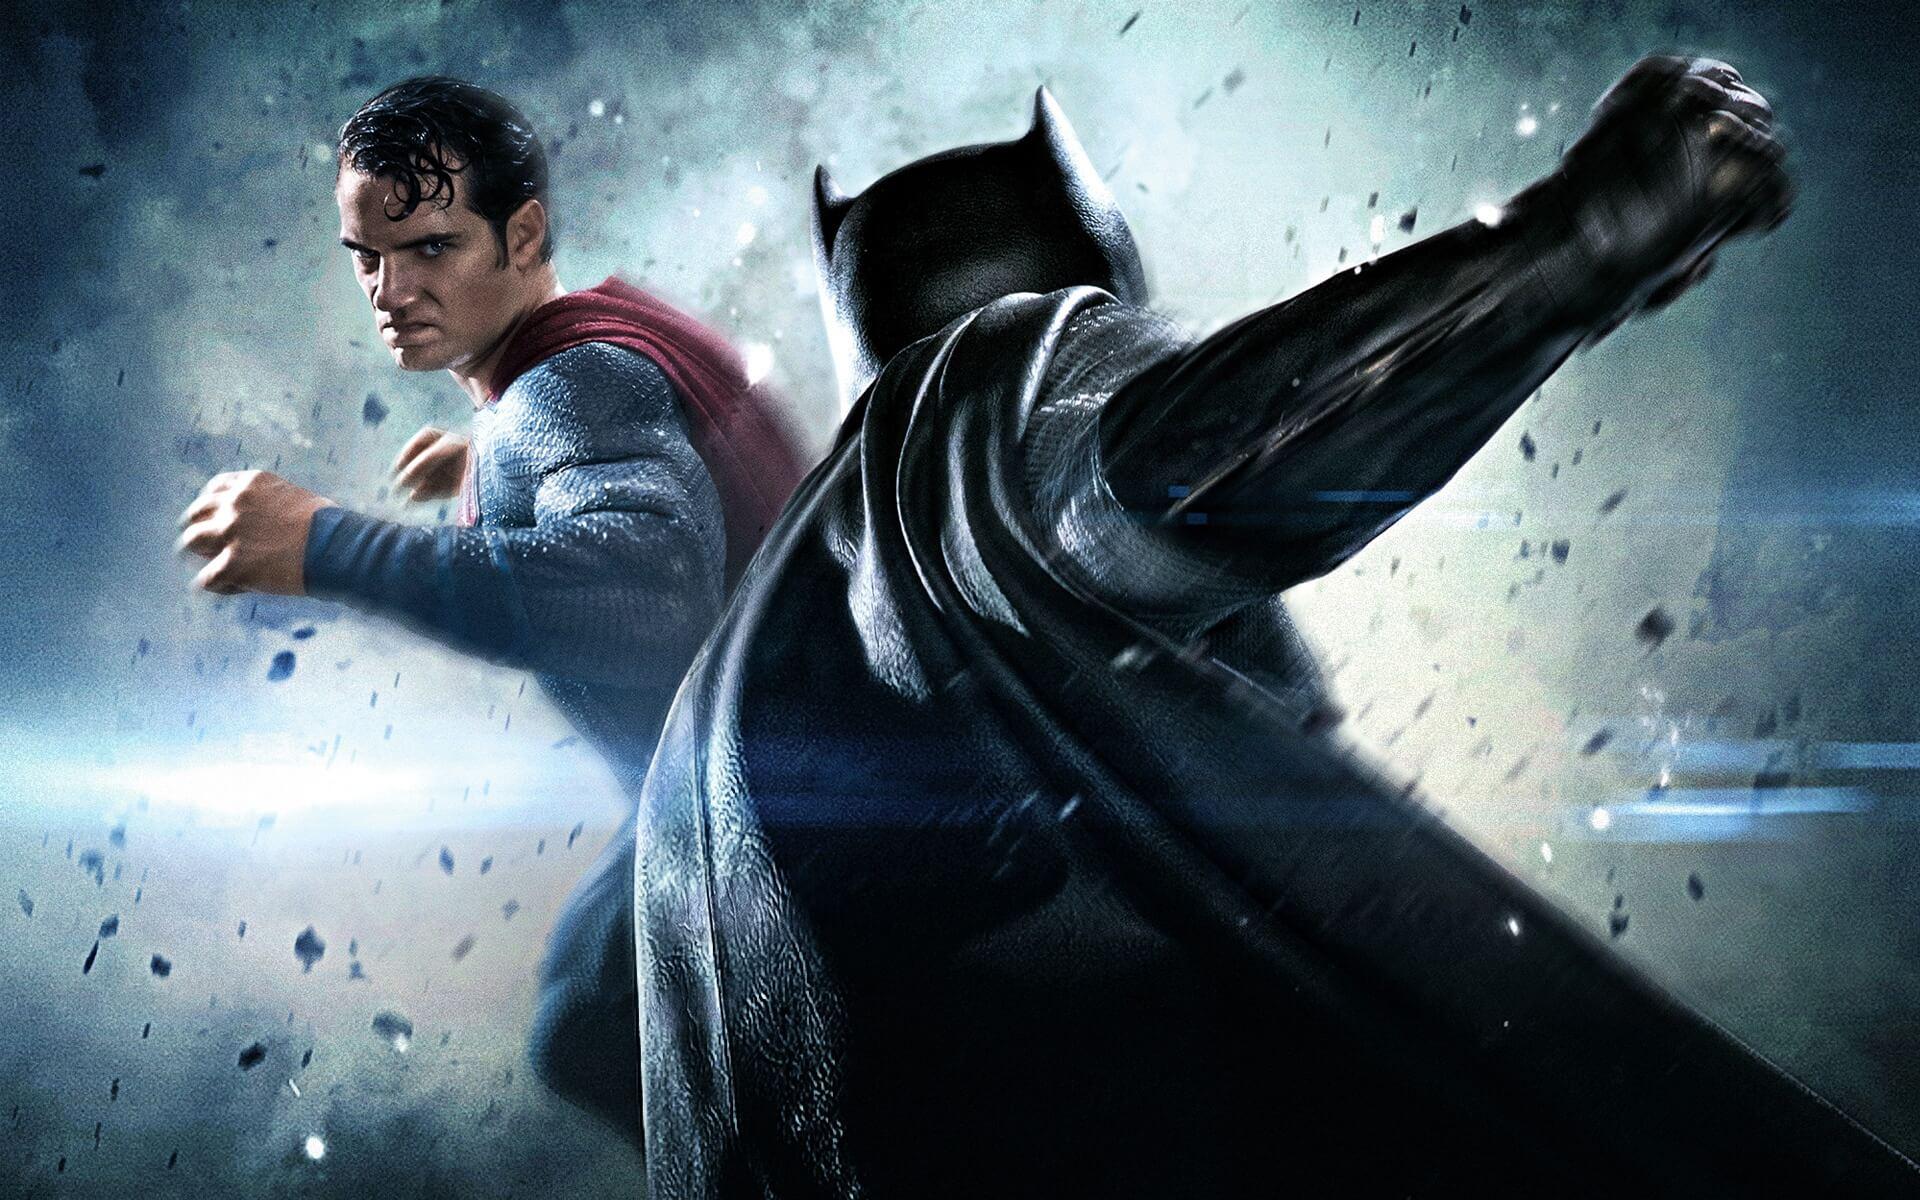 Batman v Superman Spoilercast Stimulated Boredom Dana Sciandra